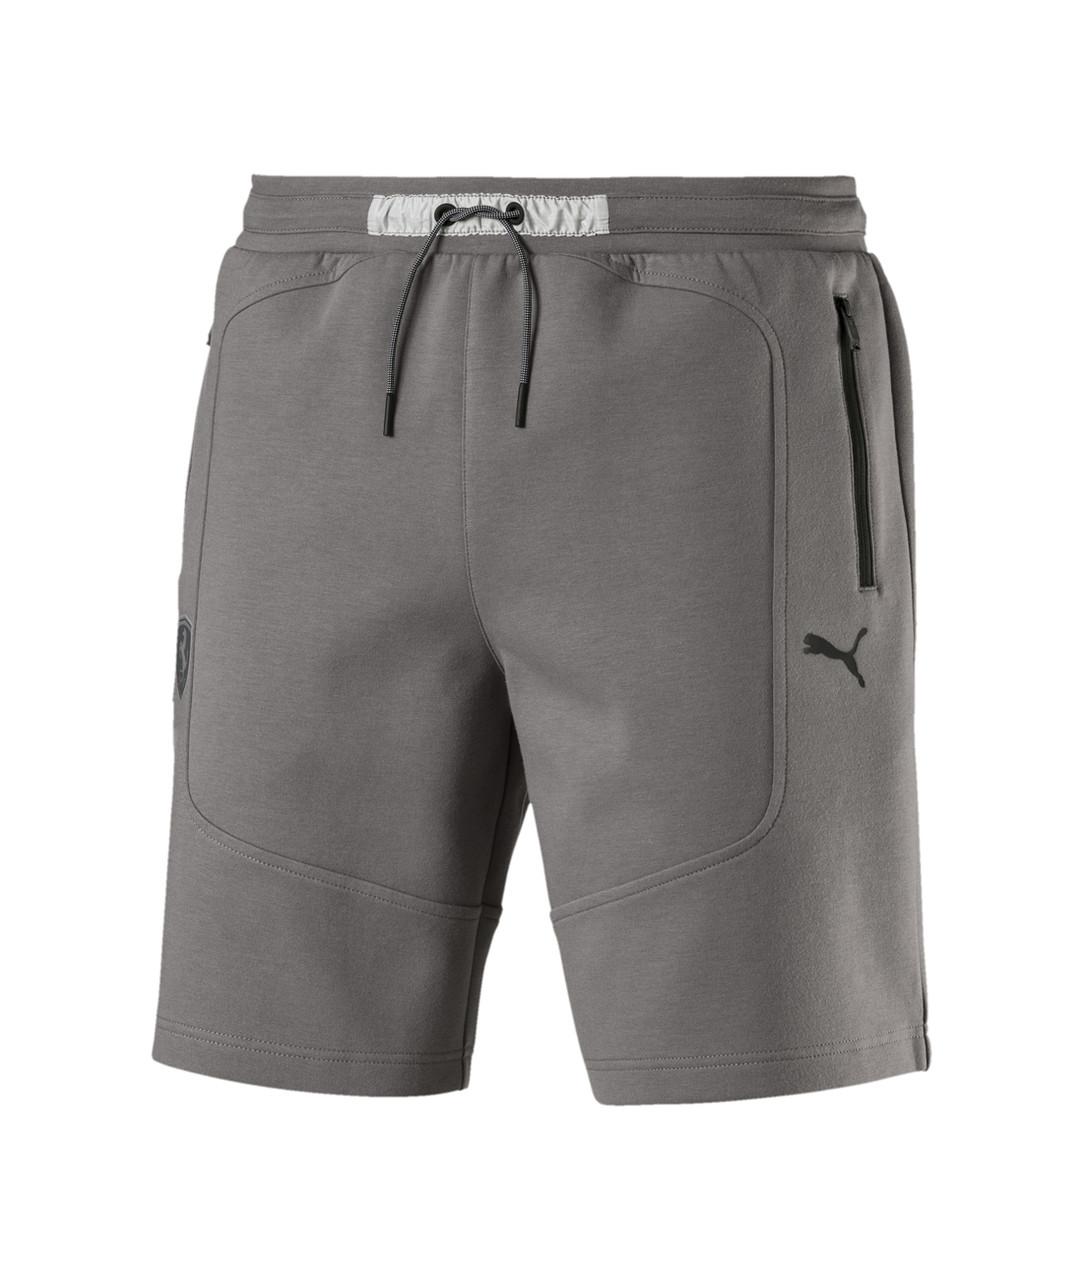 Мужские спортивный шорты Ferrari Knitted Men'S Shorts